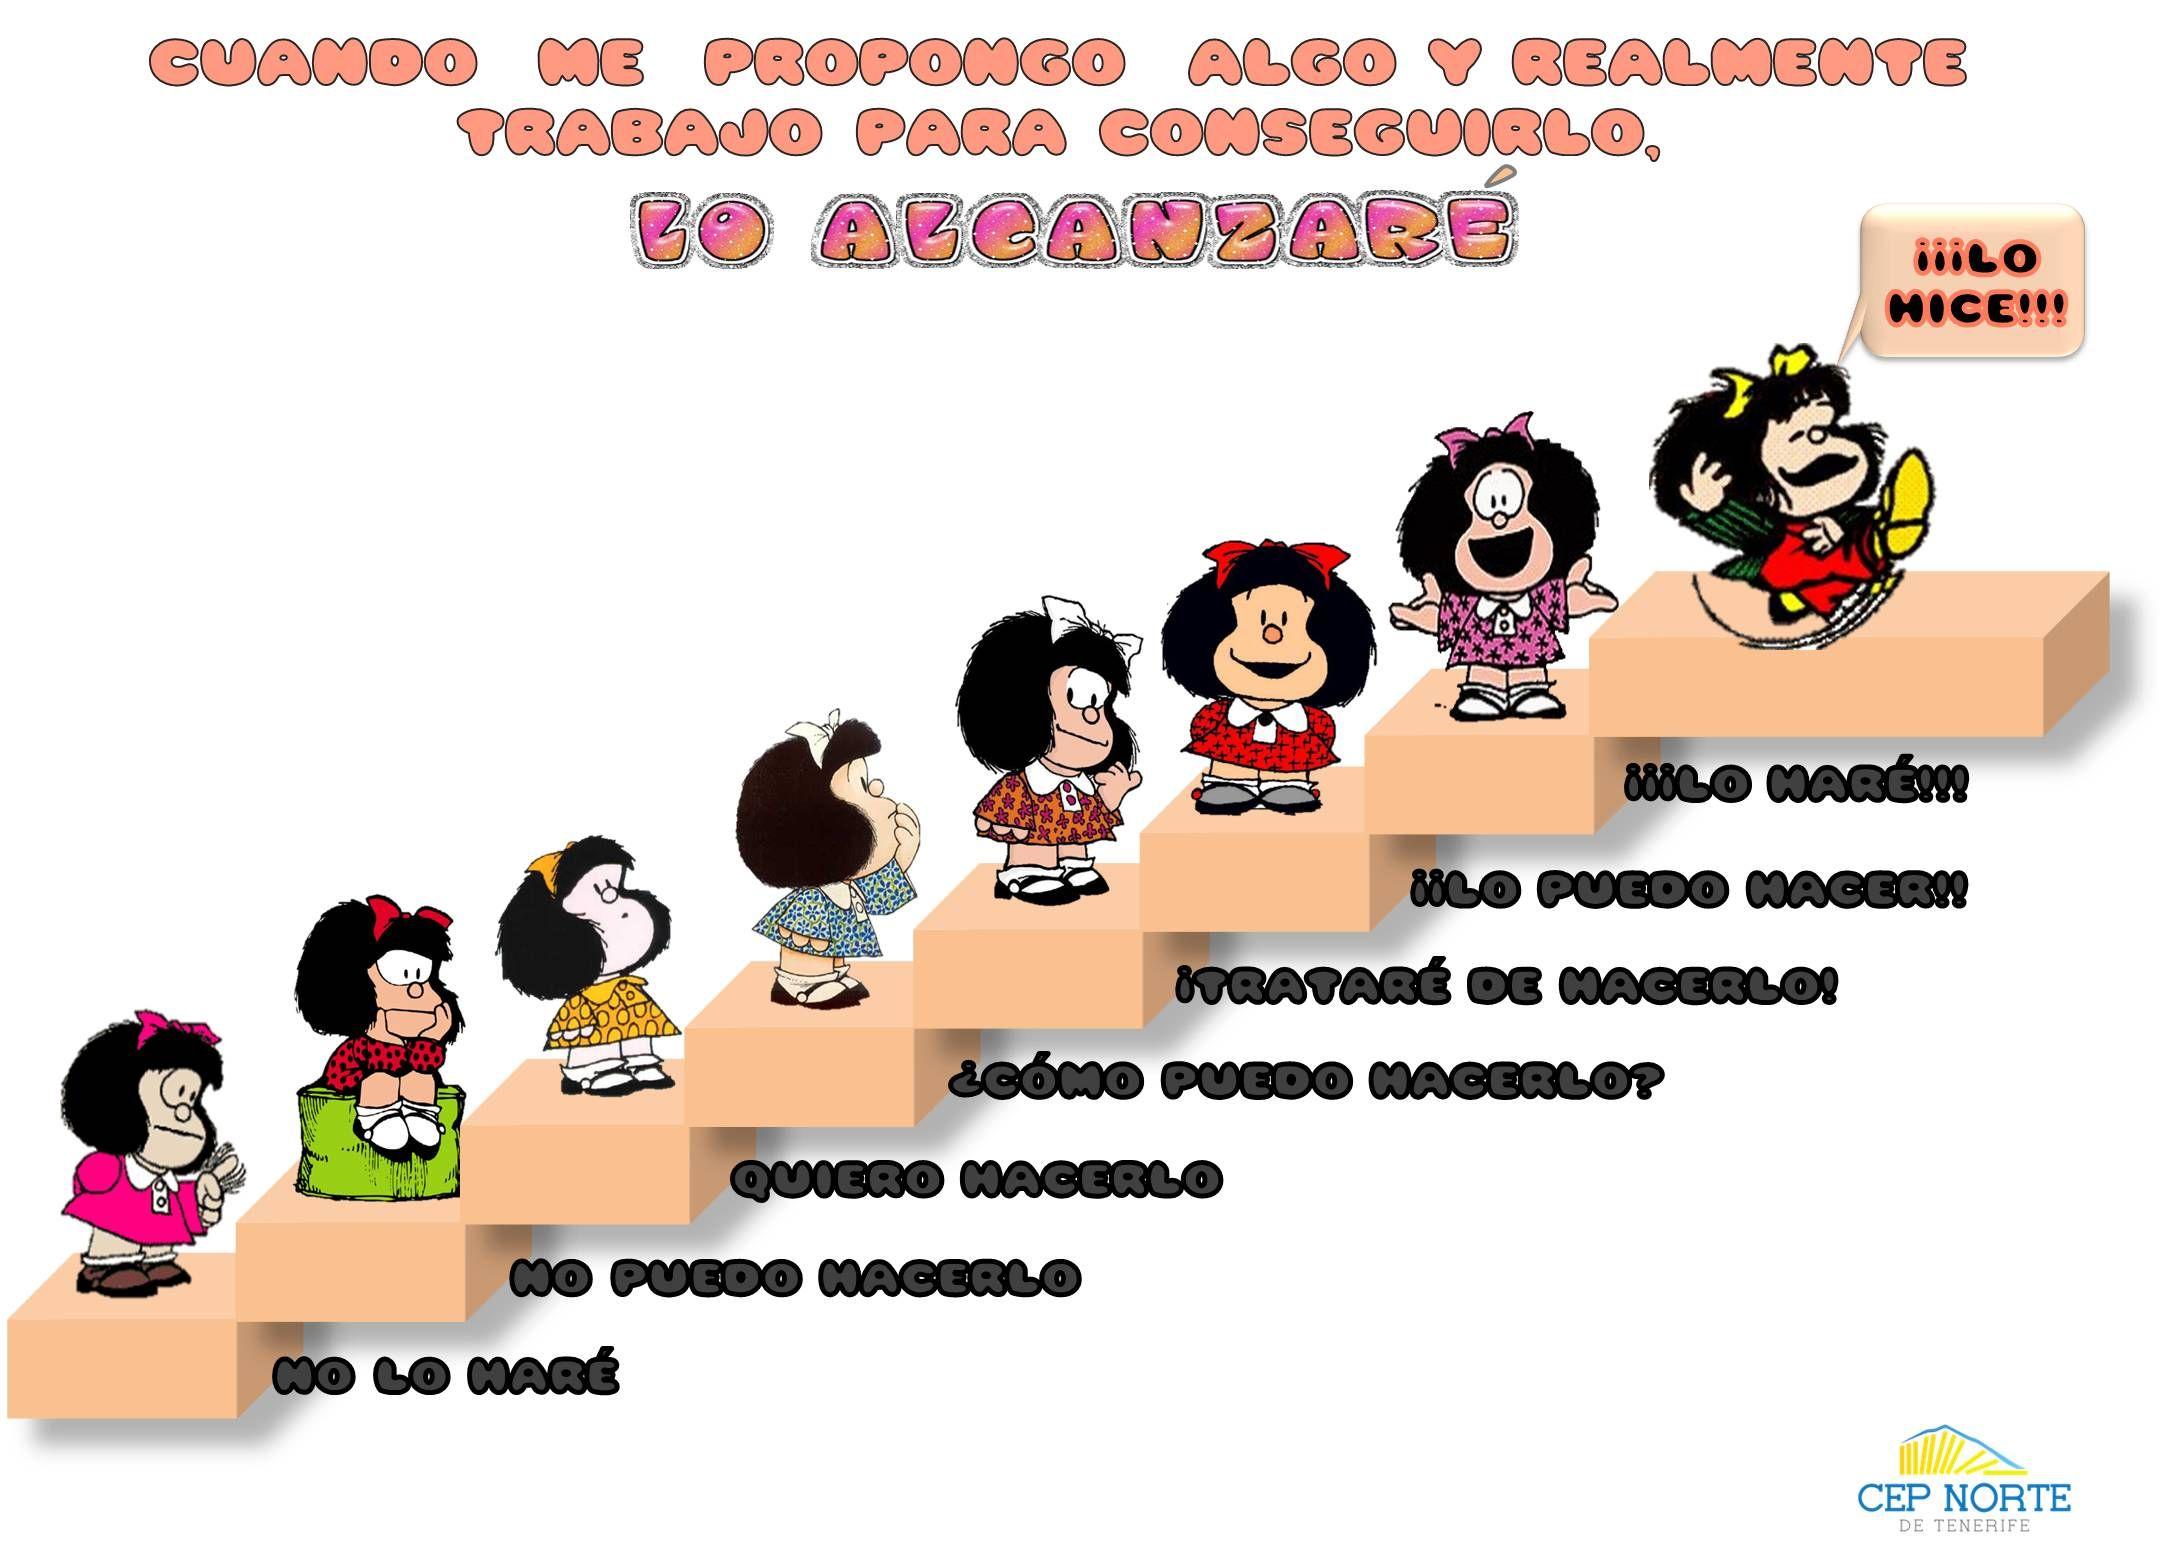 imagenes de amistad mafalda - IMG MLP